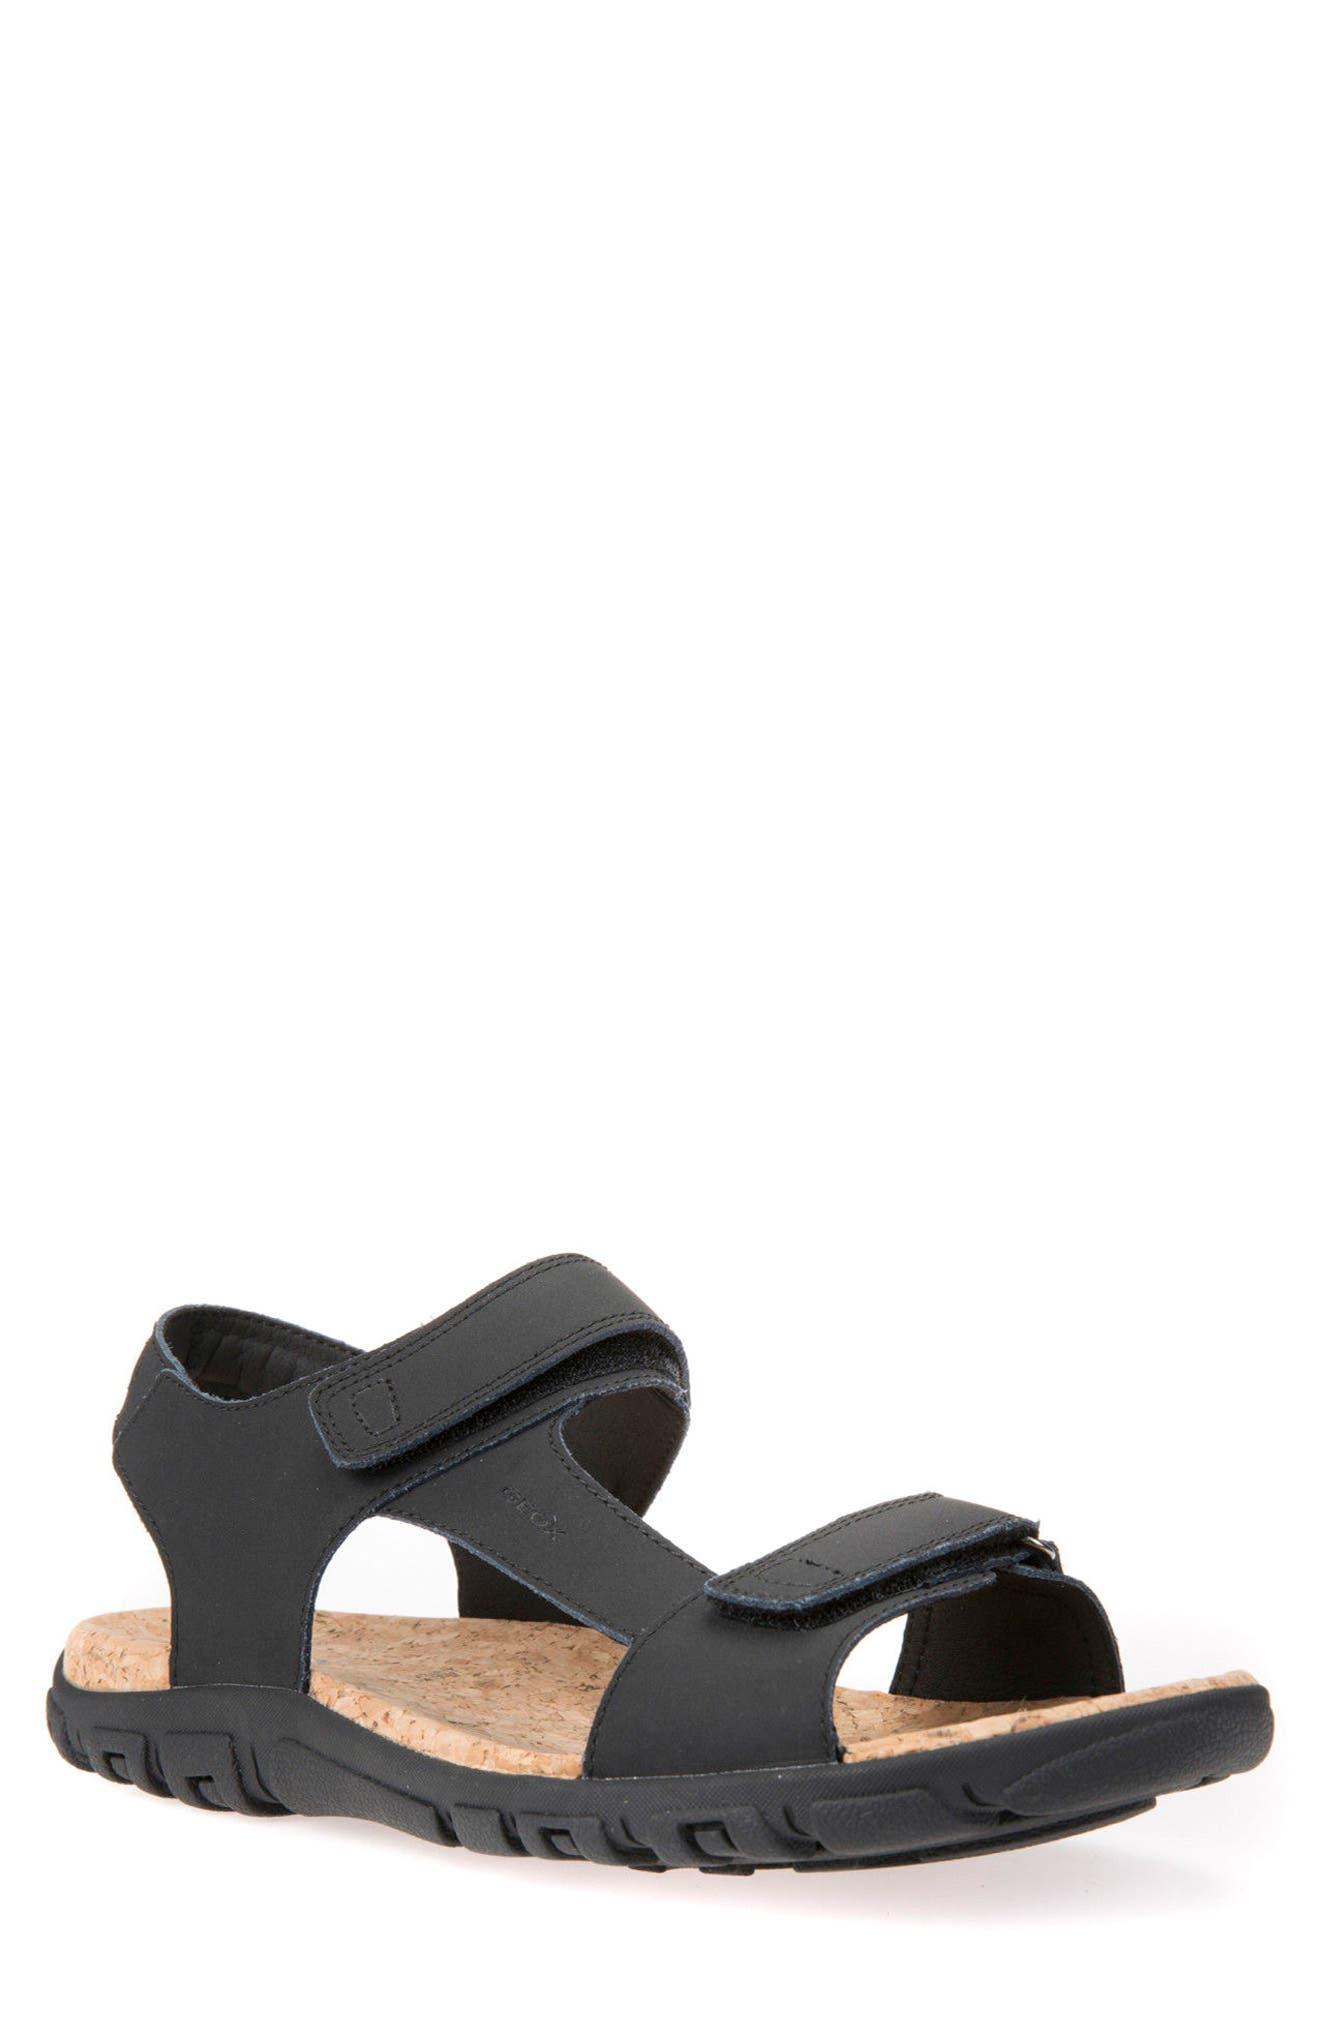 Strada 26 Sport Sandal,                         Main,                         color, Black Leather